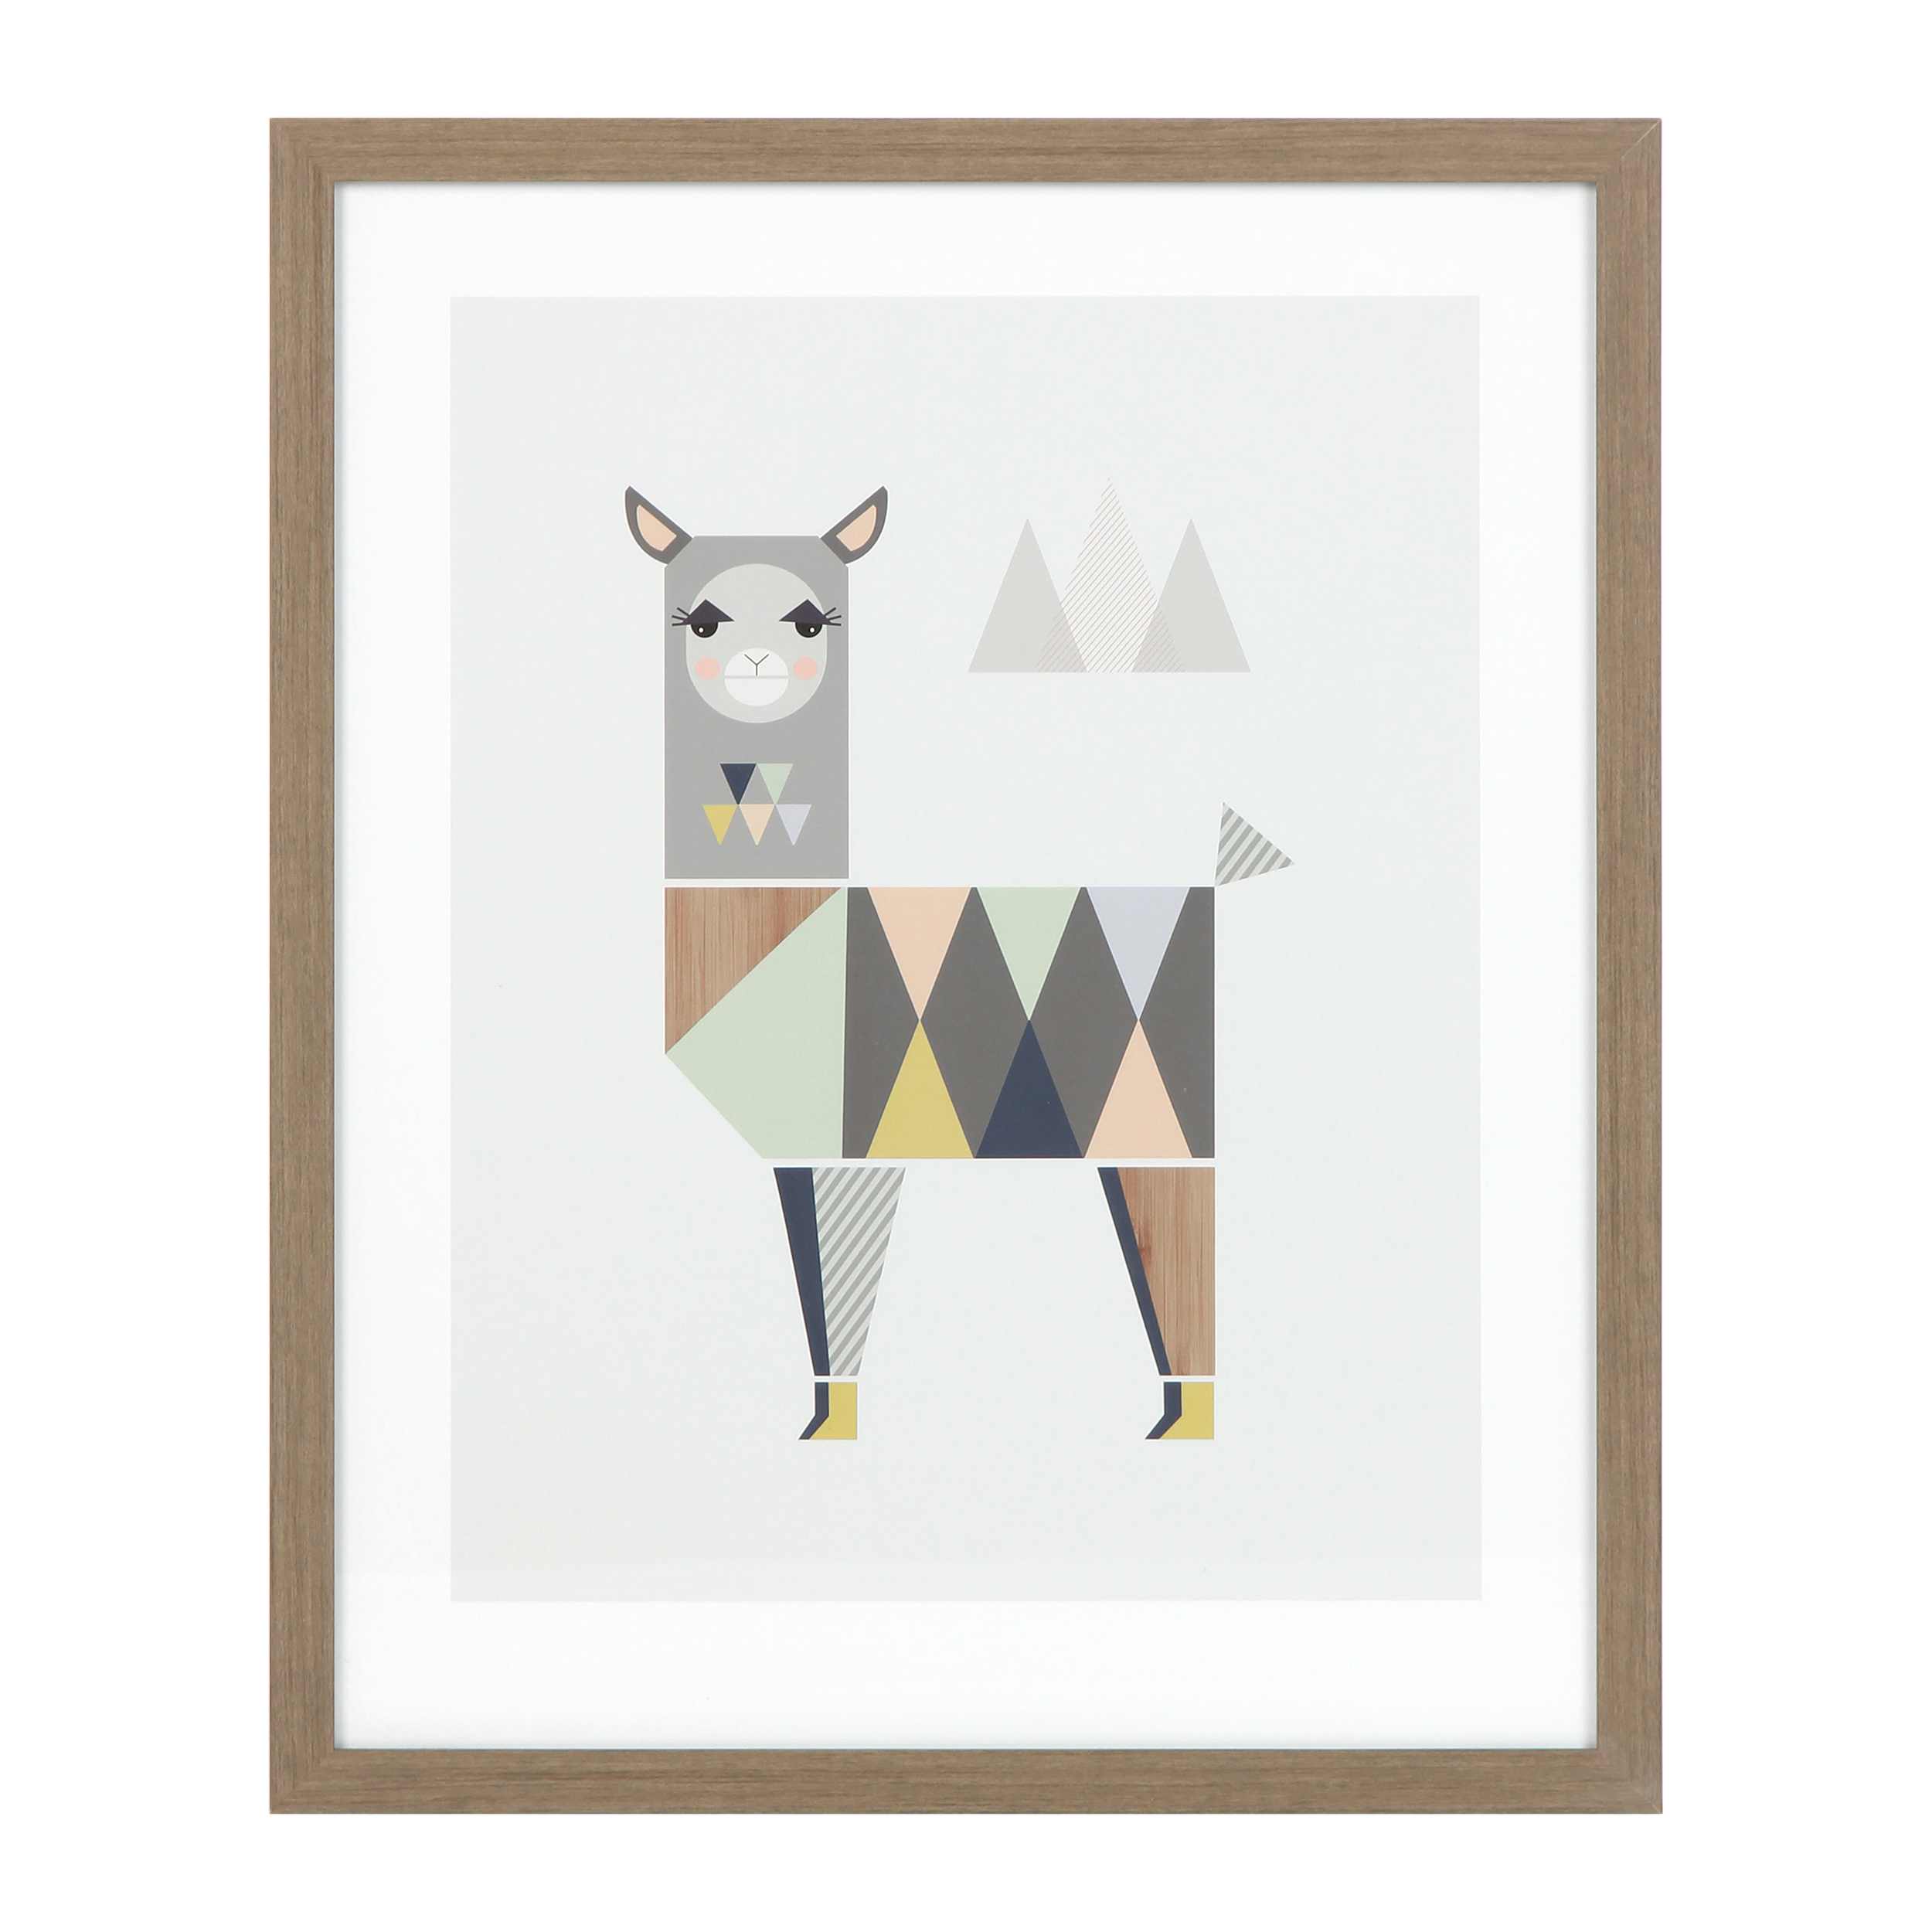 Постер Llama llama llama sand and sun